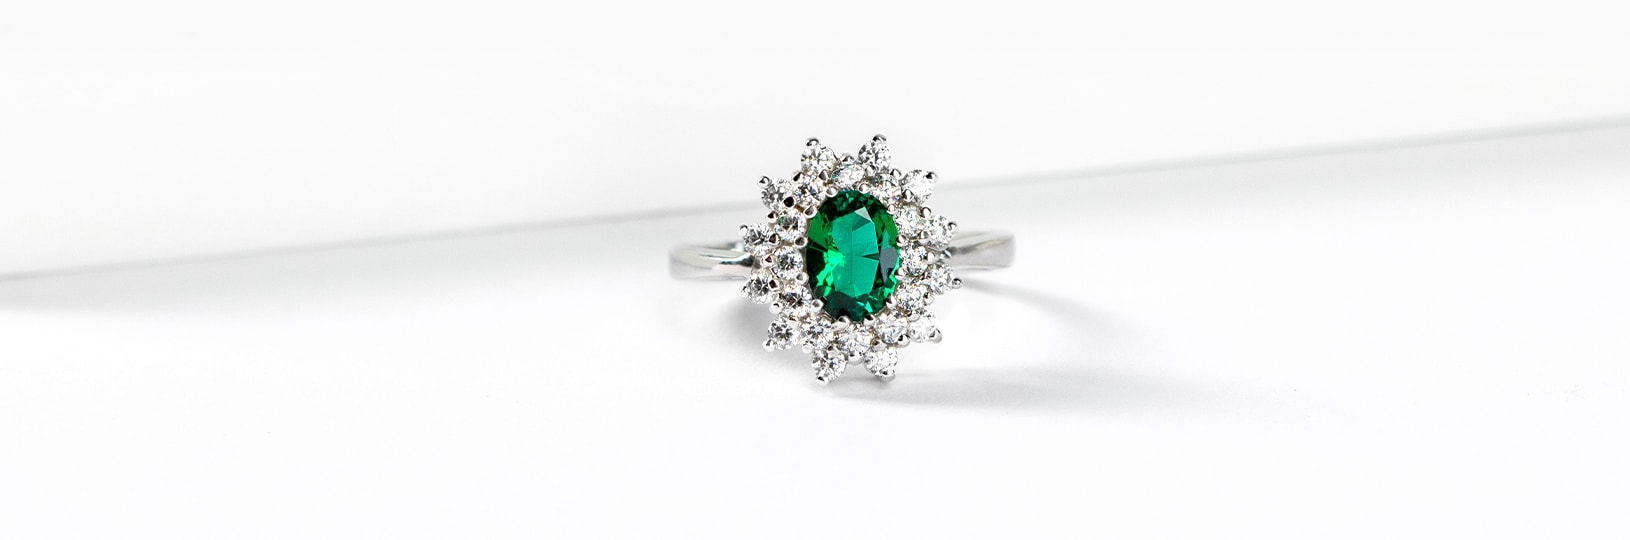 Halo emerald engagement ring